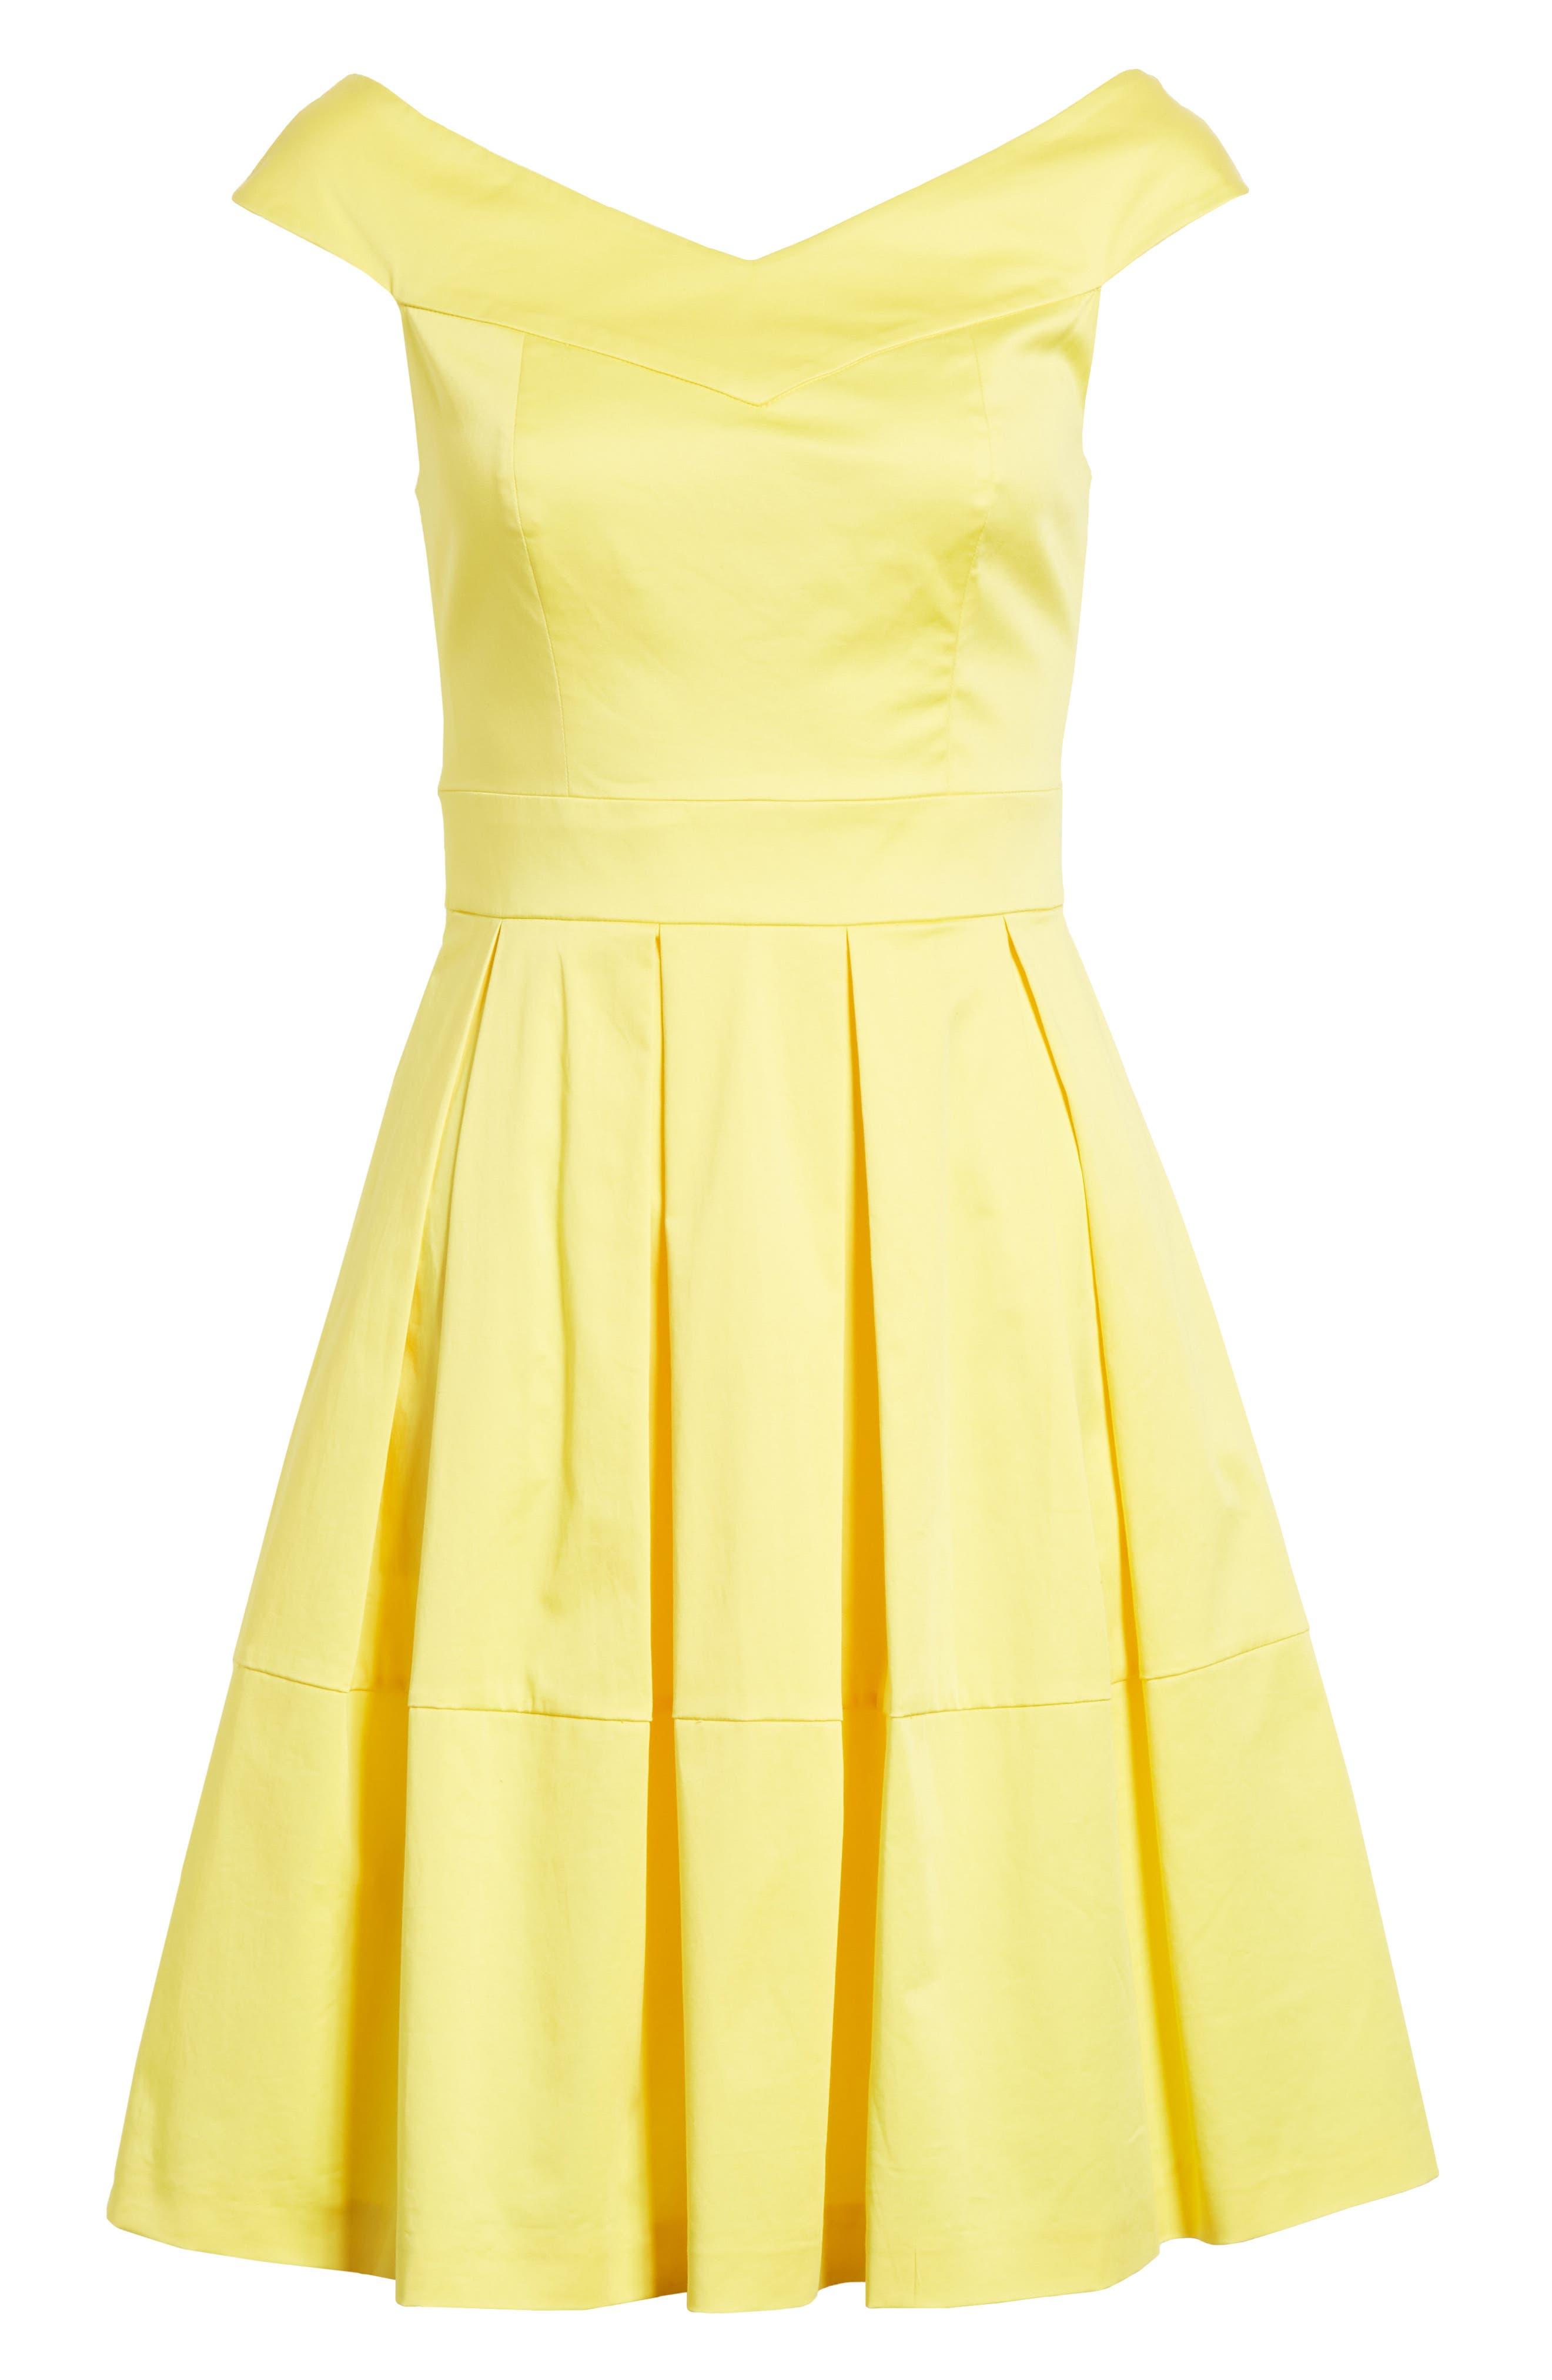 Jullee Off the Shoulder Stretch Cotton Dress,                             Alternate thumbnail 6, color,                             720